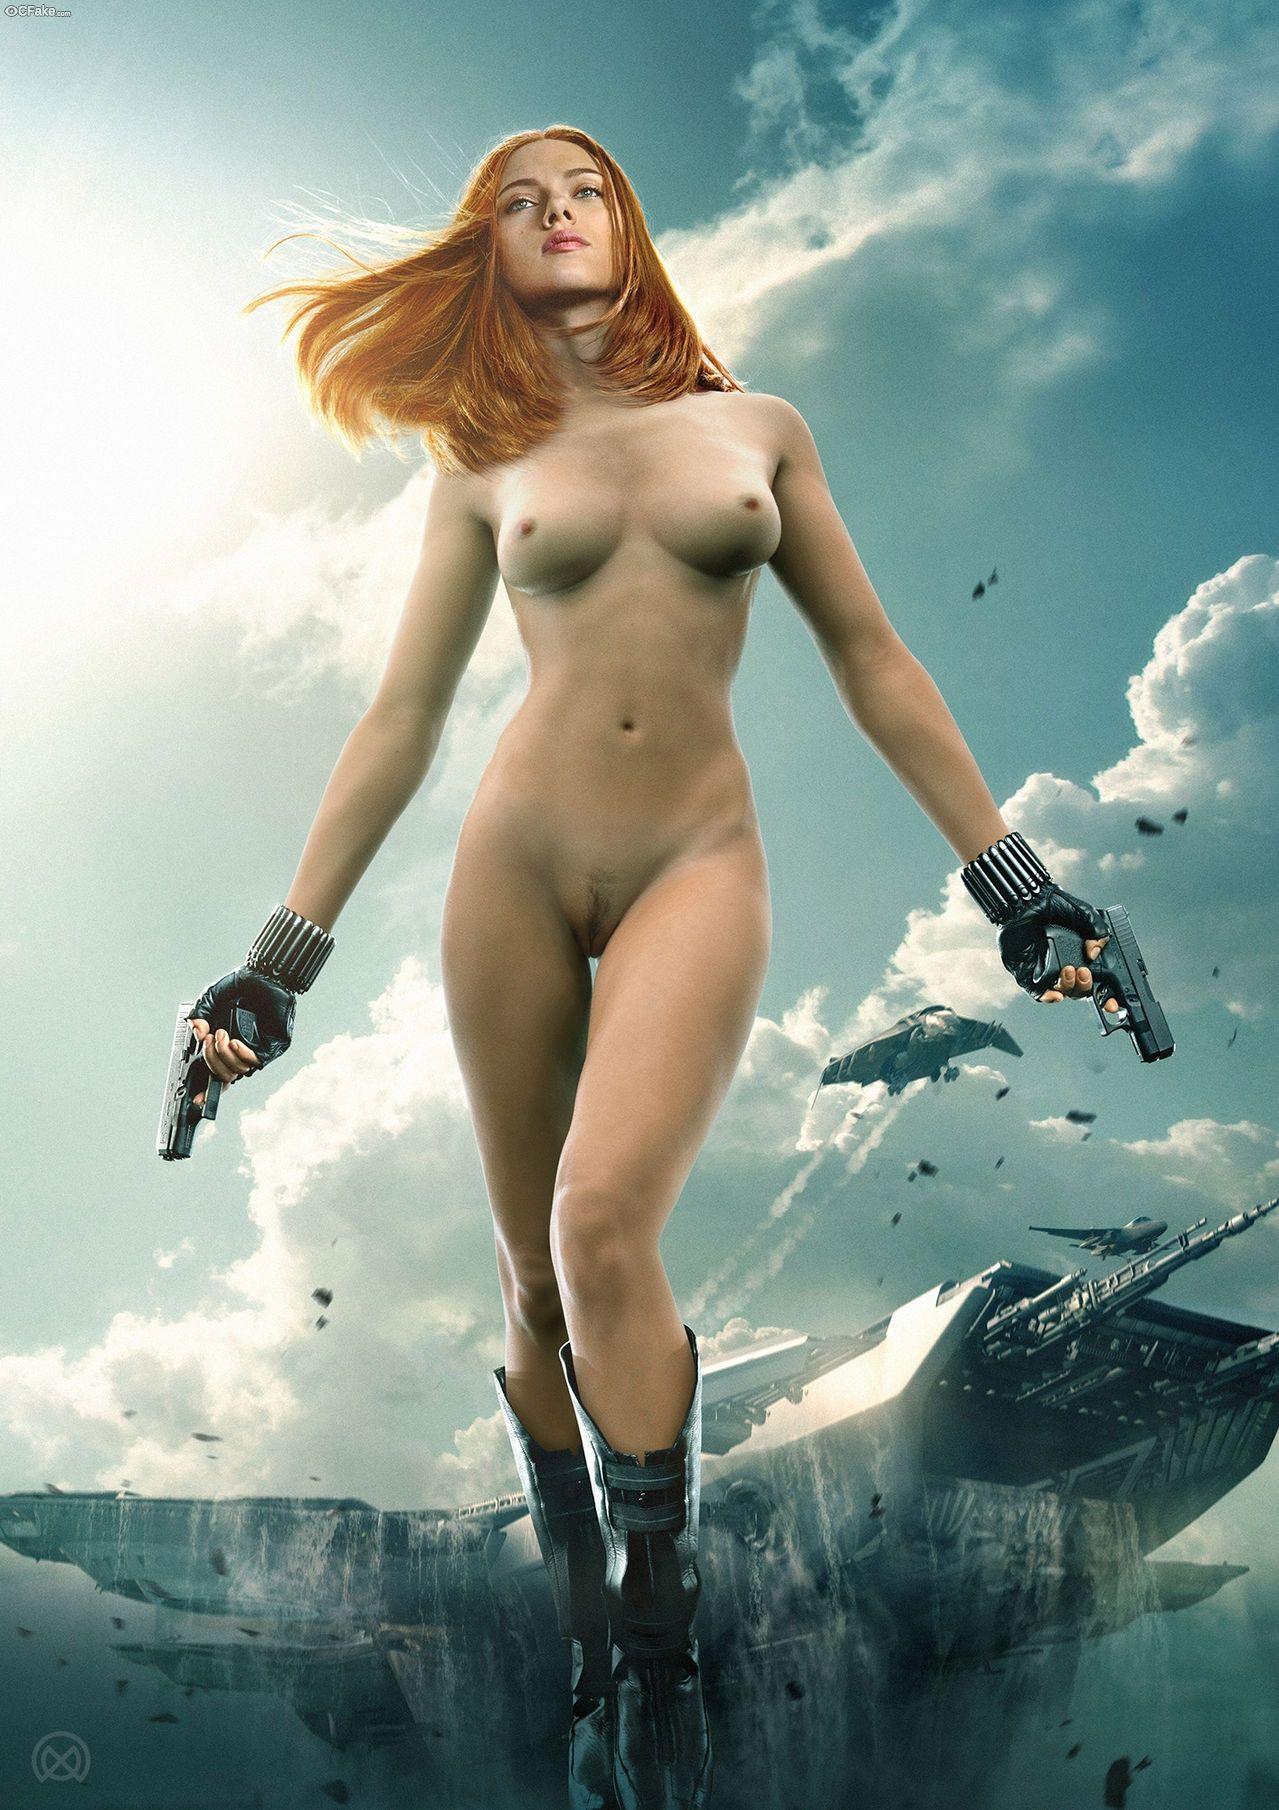 superheroine naked Nude Superheroines: superhero erotic : Photo | Black Widow // Natasha  Romanov | Pinterest | Black widow, Poster and Photos